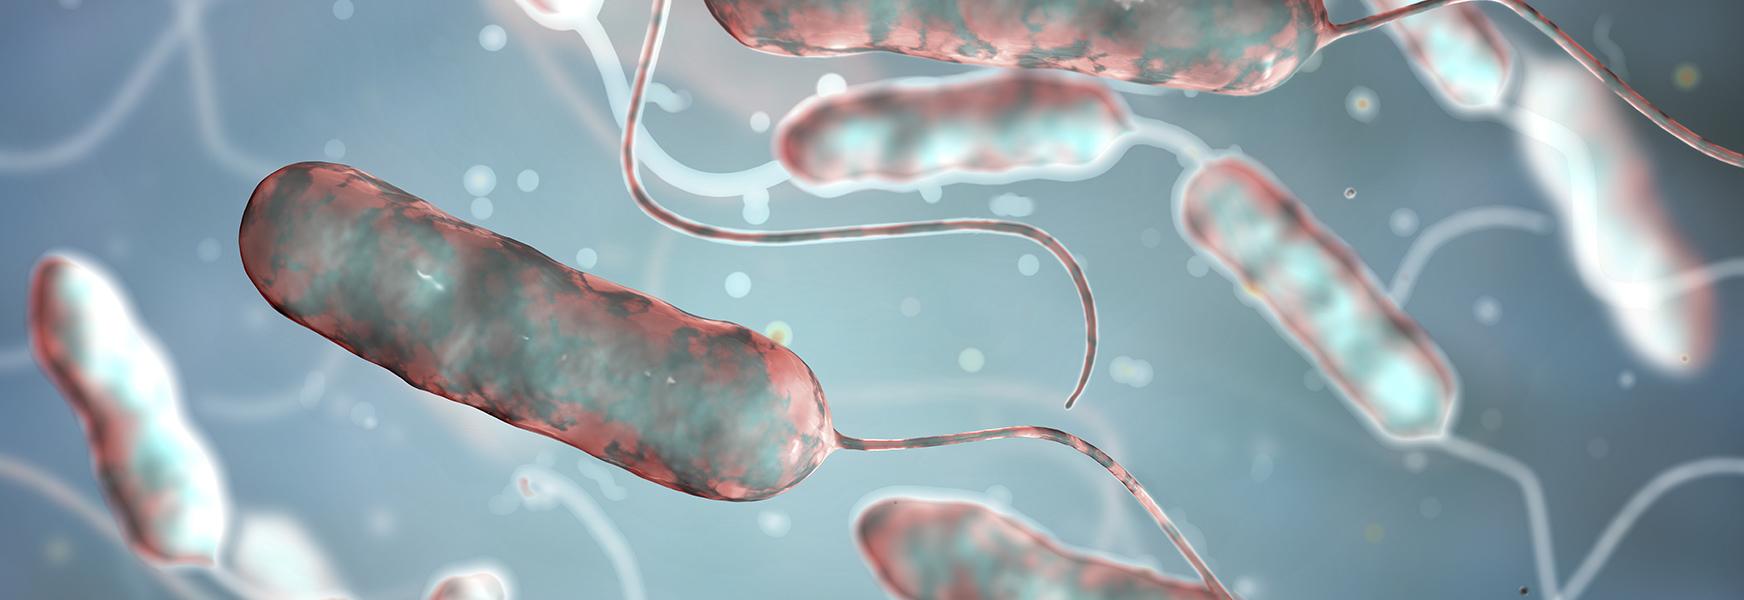 Legionnaires Disease Bacteria